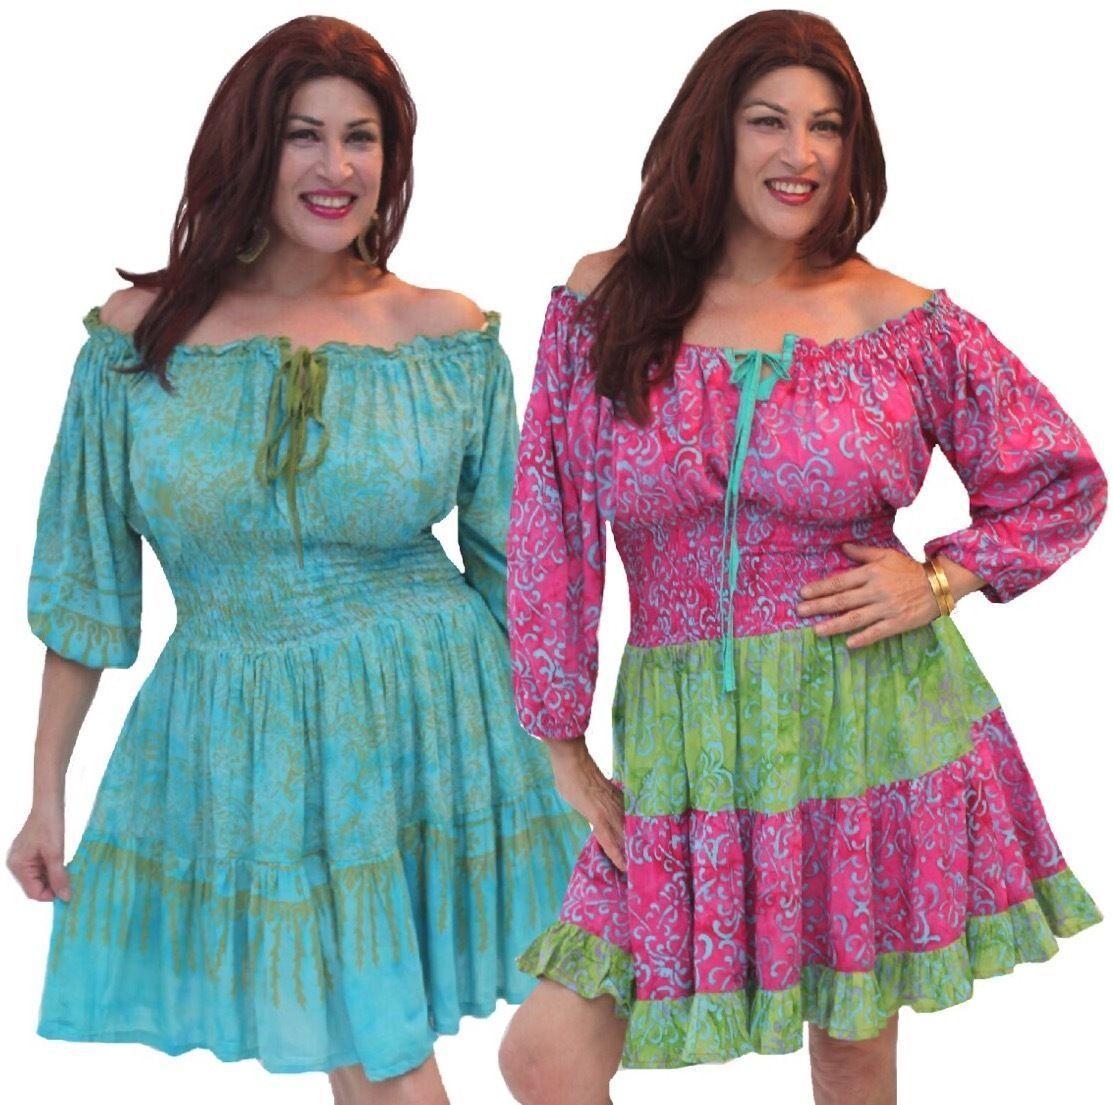 Pick Farbe mini dress blouse smocked tiers batik art OS M L XL 1X 2X